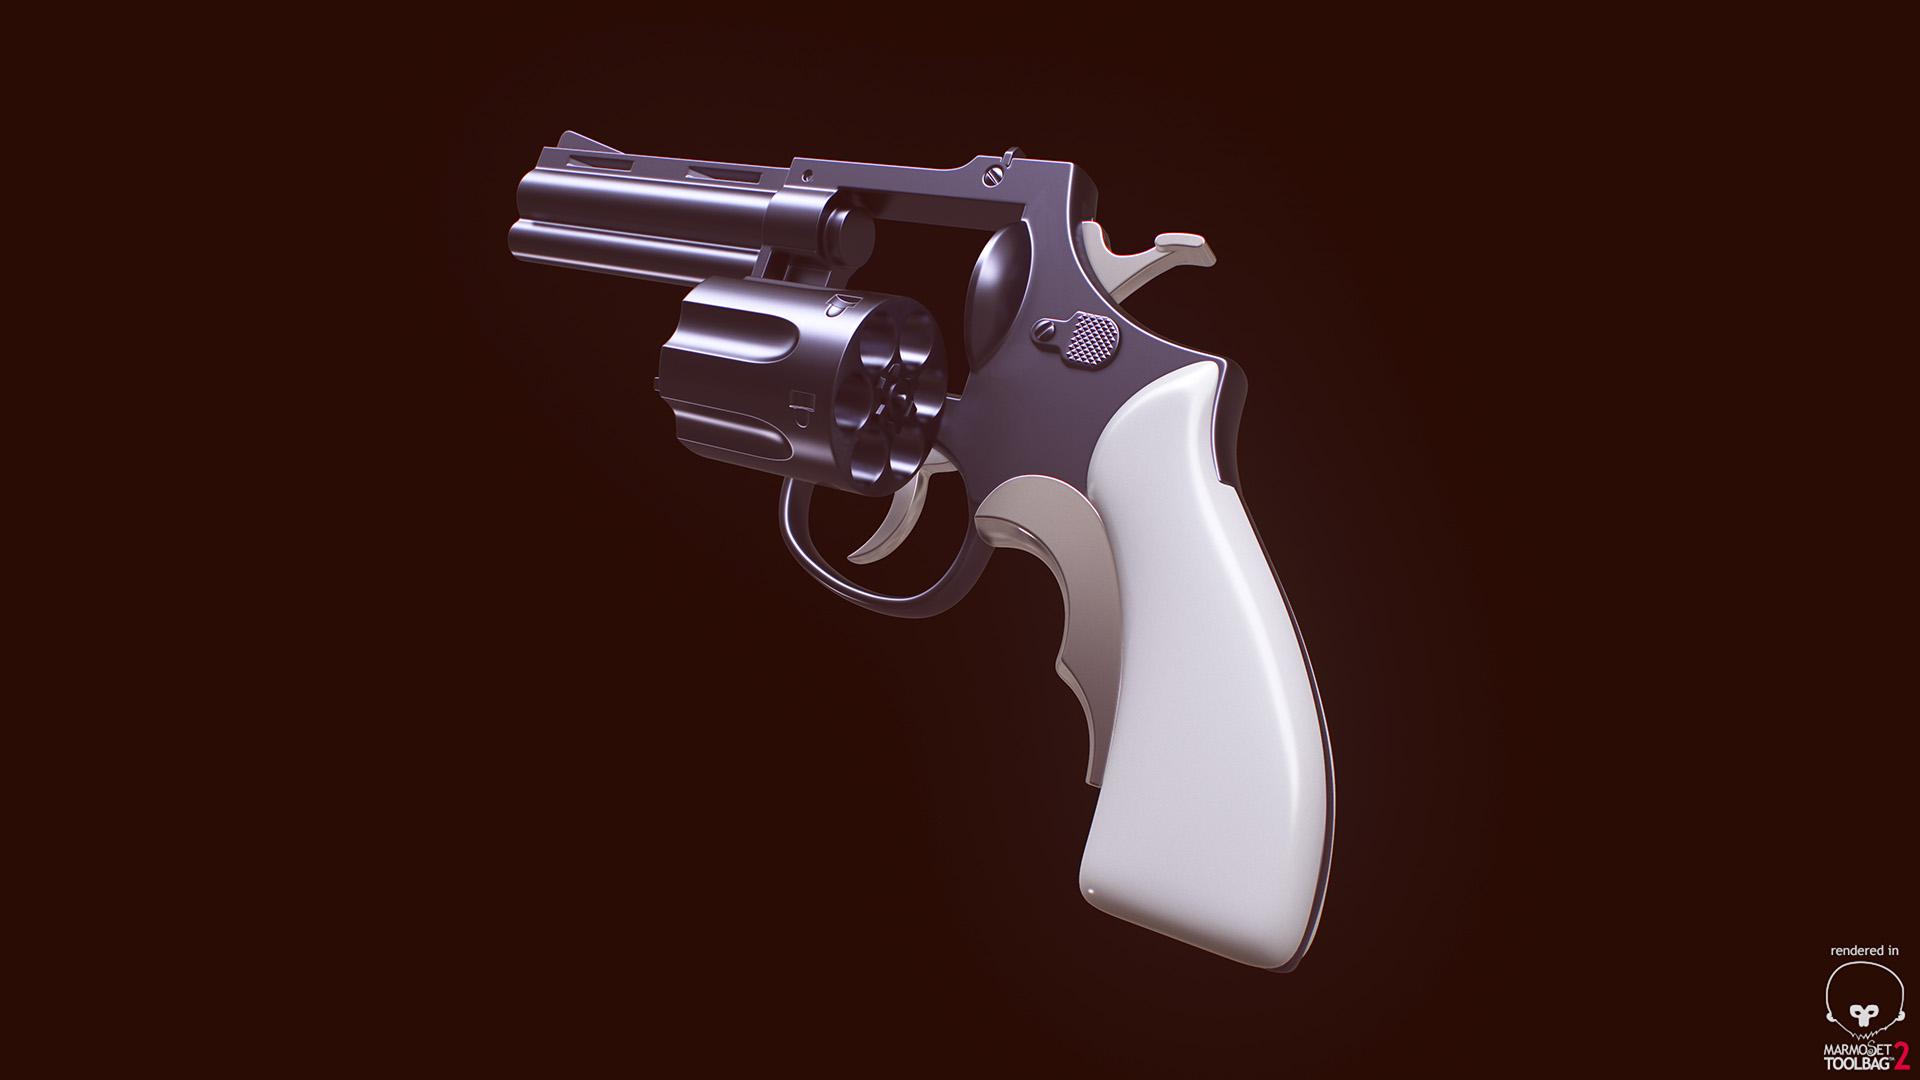 custom__38_special_revolver___wip01___marmoset_2_by_imsumdave-d8jaky9.jpg